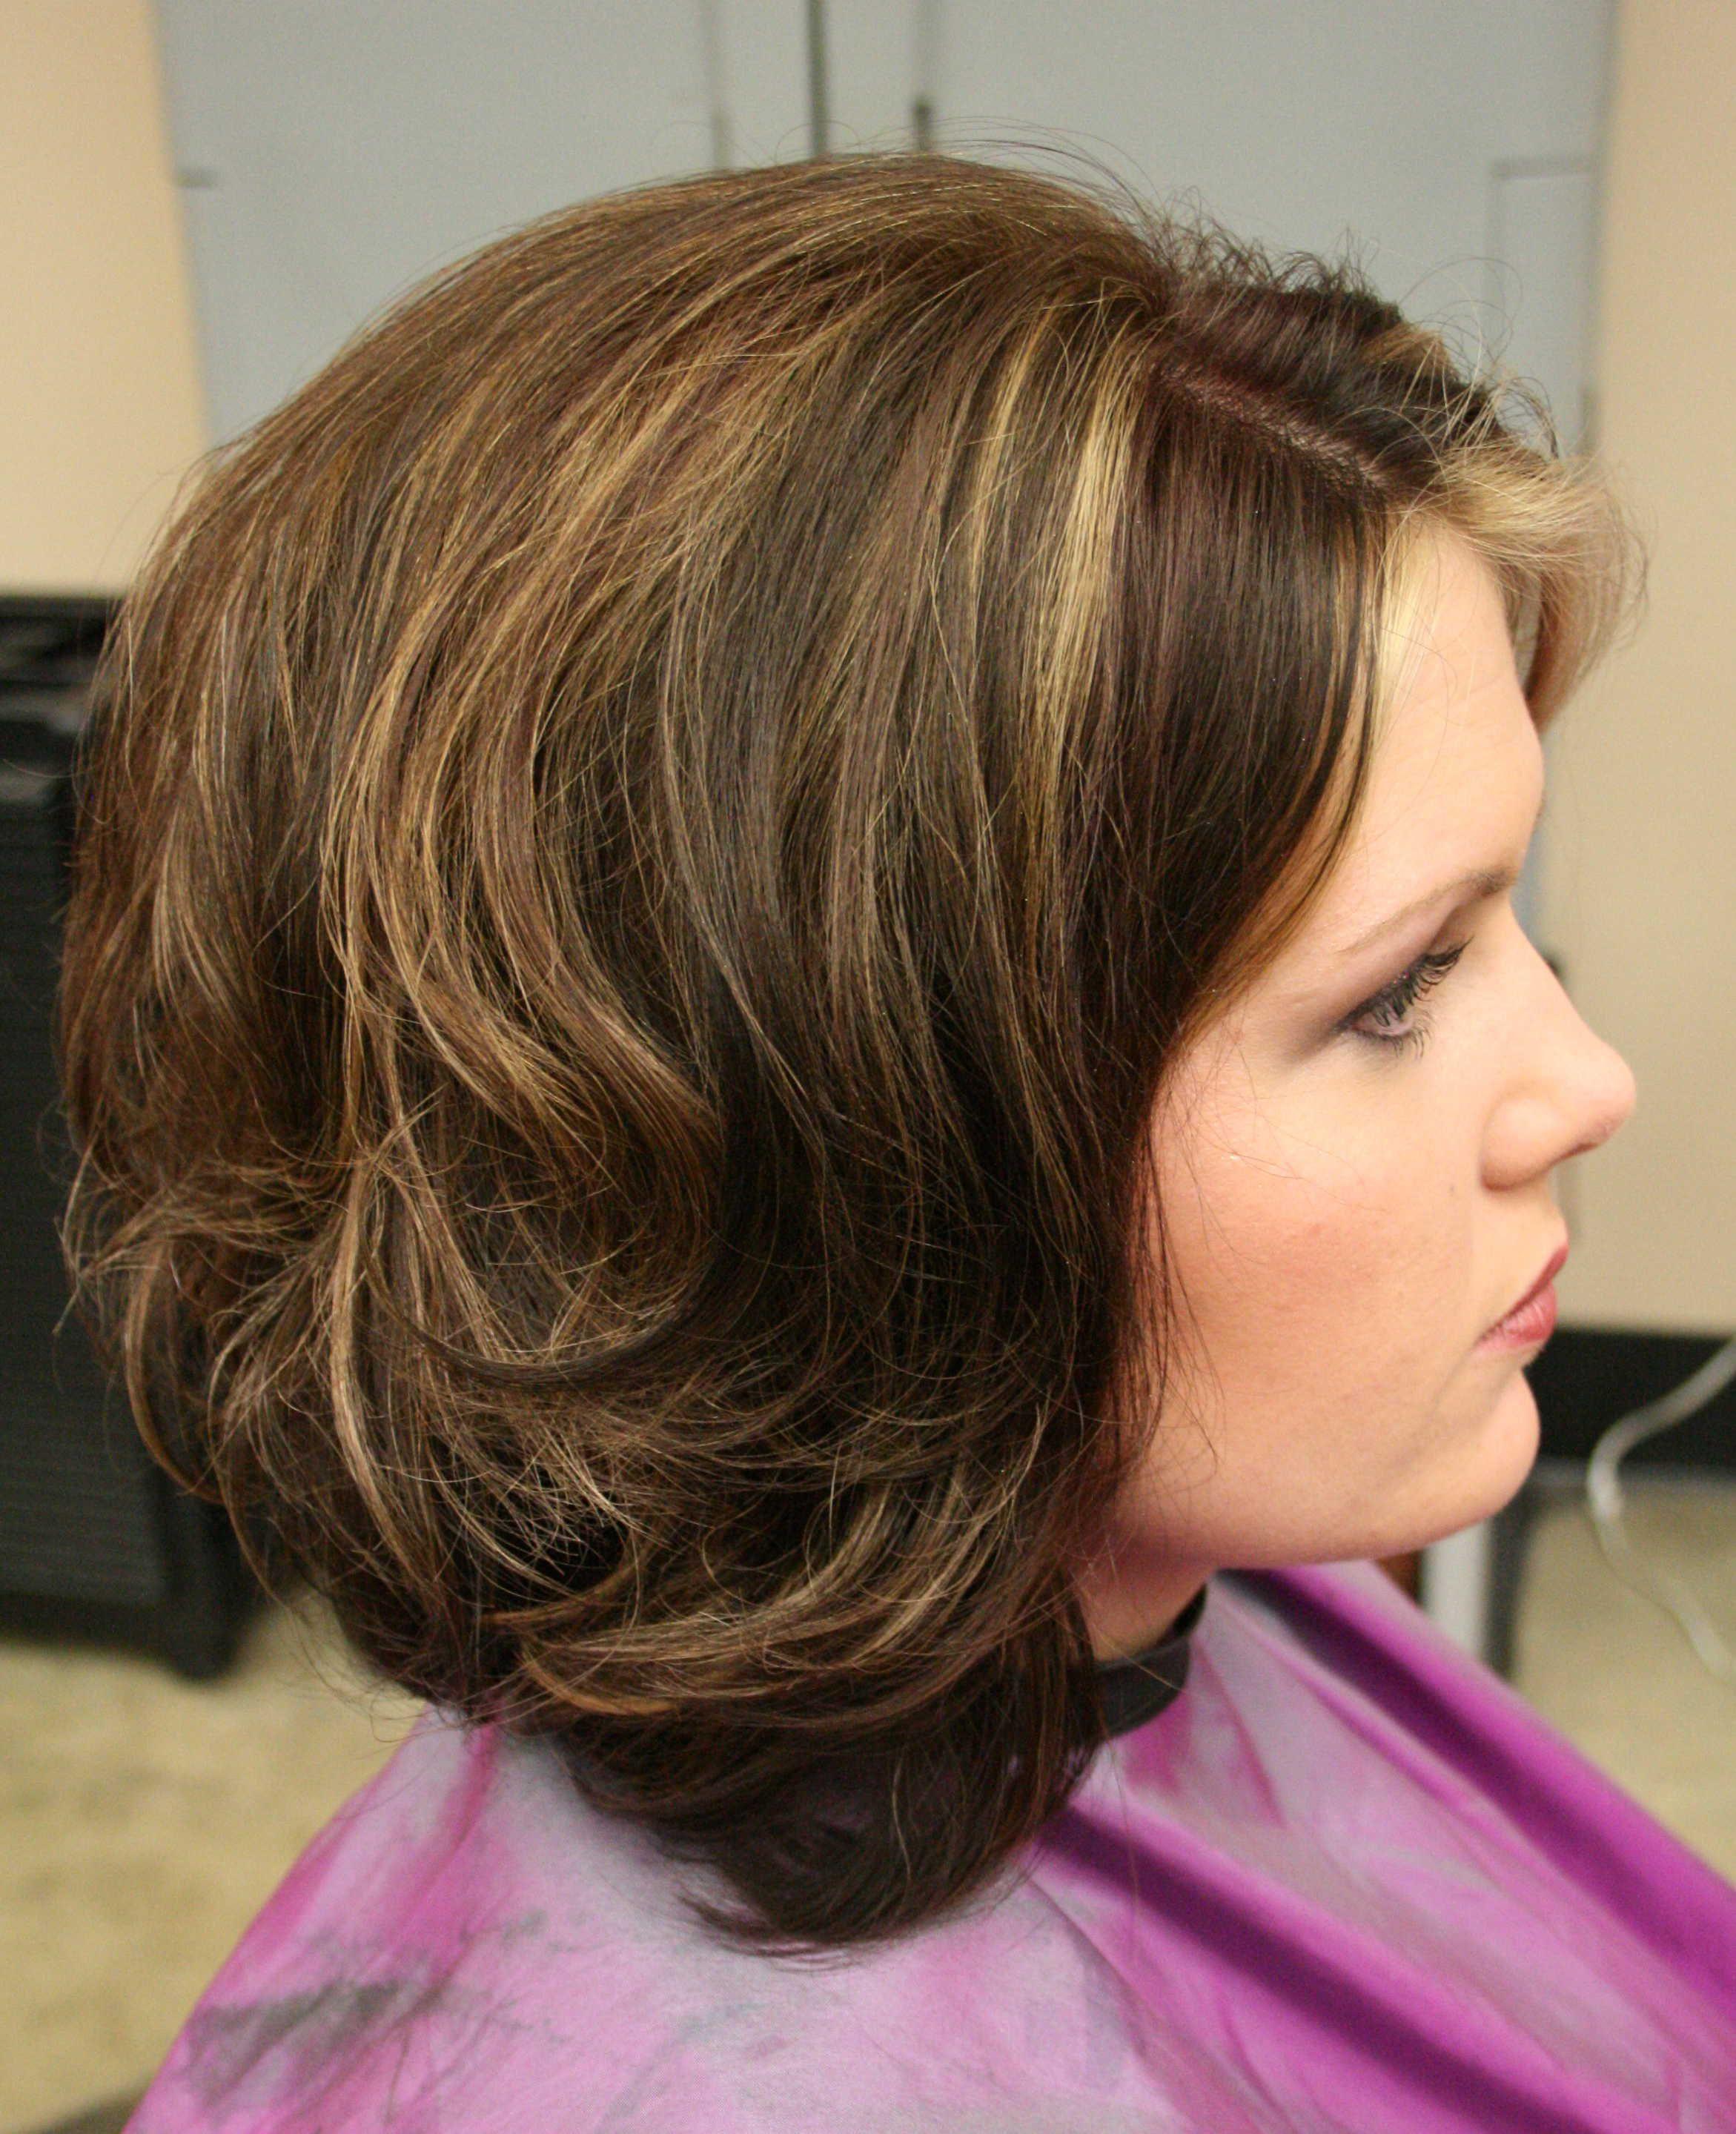 Medium layered medium layered haircuts back view hairstyles